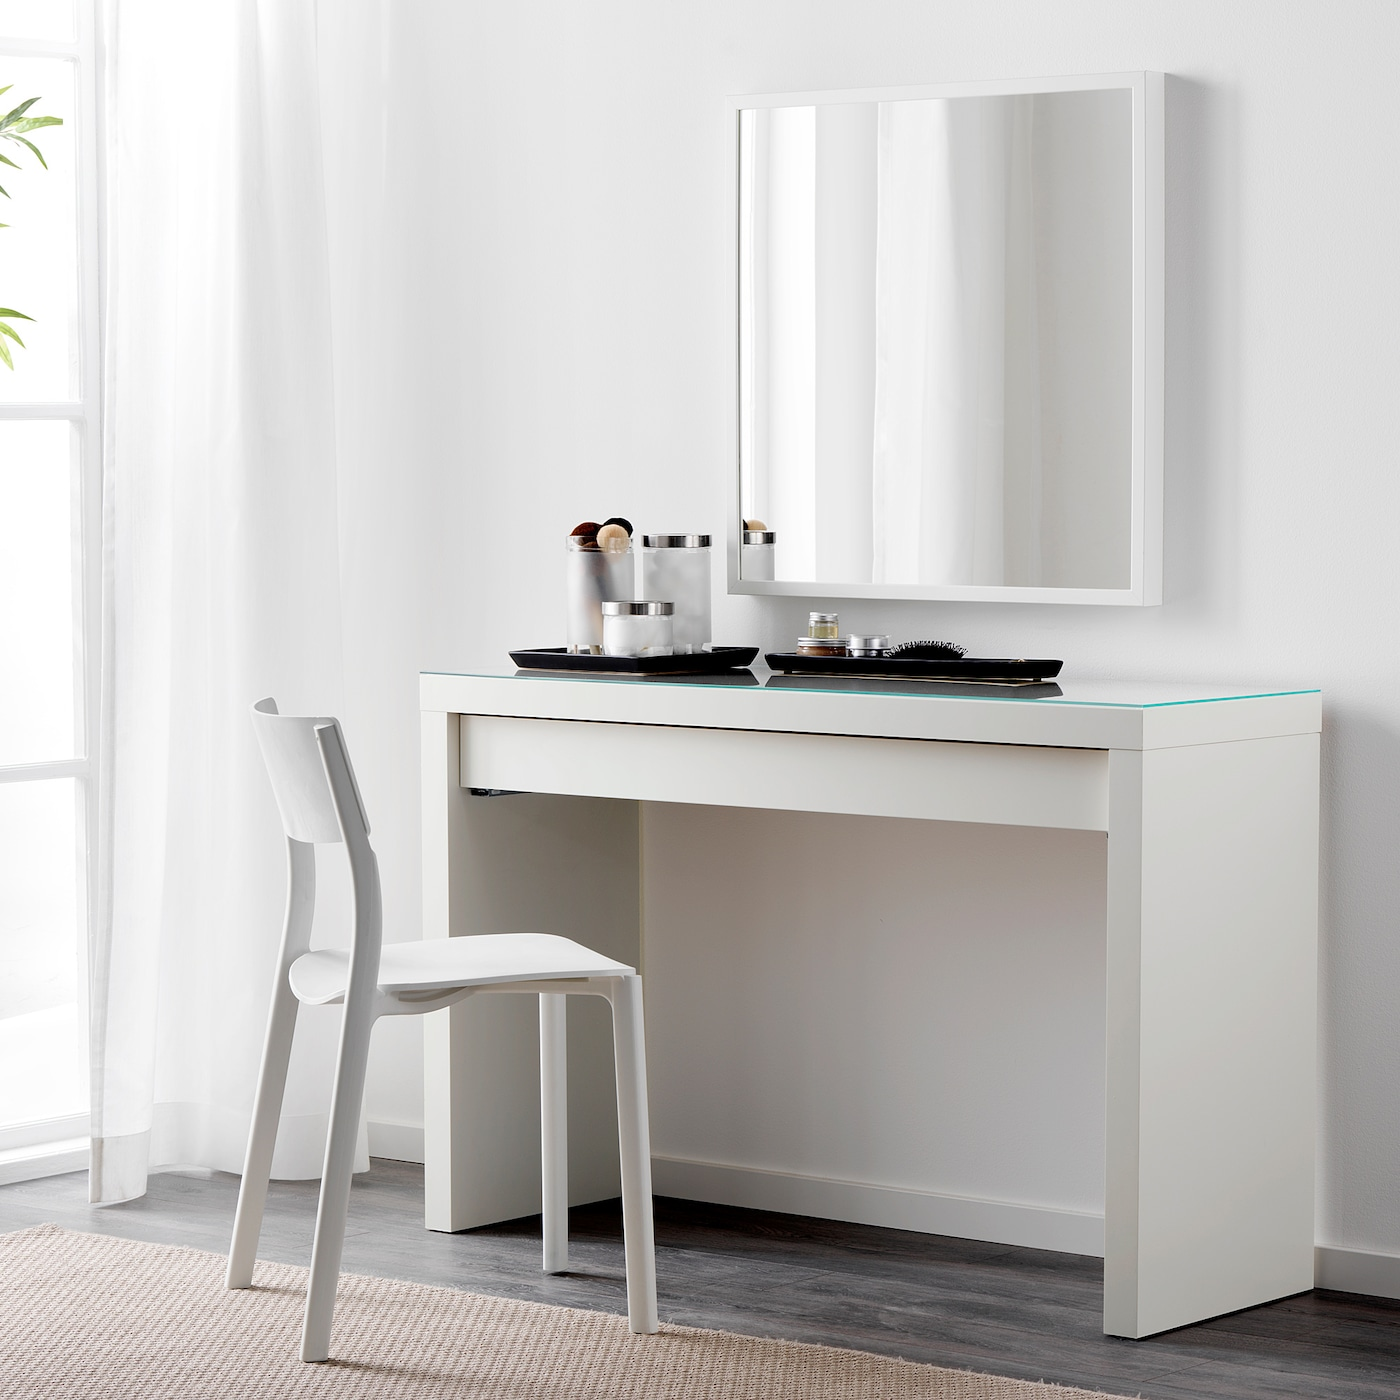 Malm Dressing Table White 47 1 4x16 8 Ikea